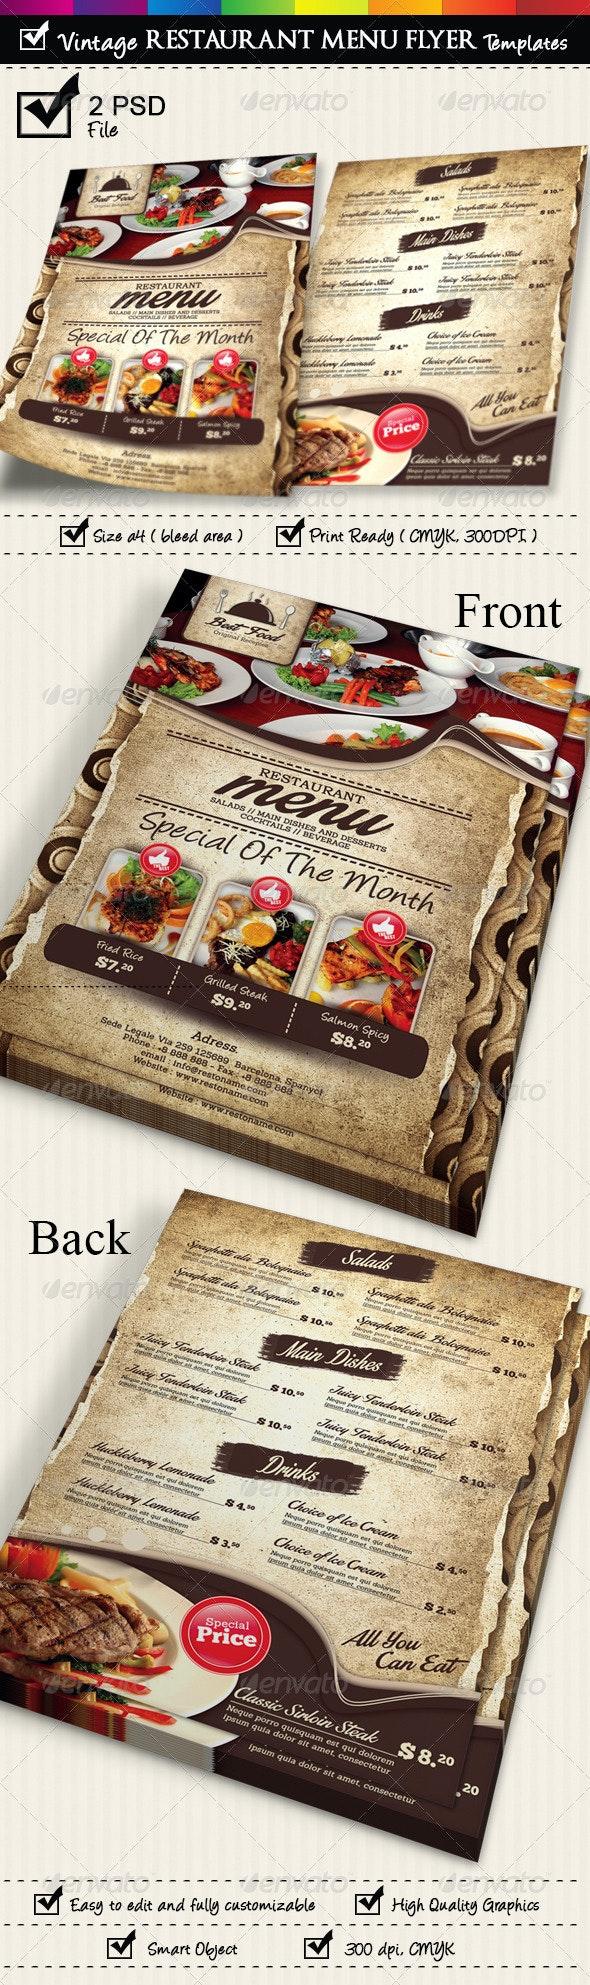 Restaurant Menu Flyer Templates Vintage Texture - Restaurant Flyers